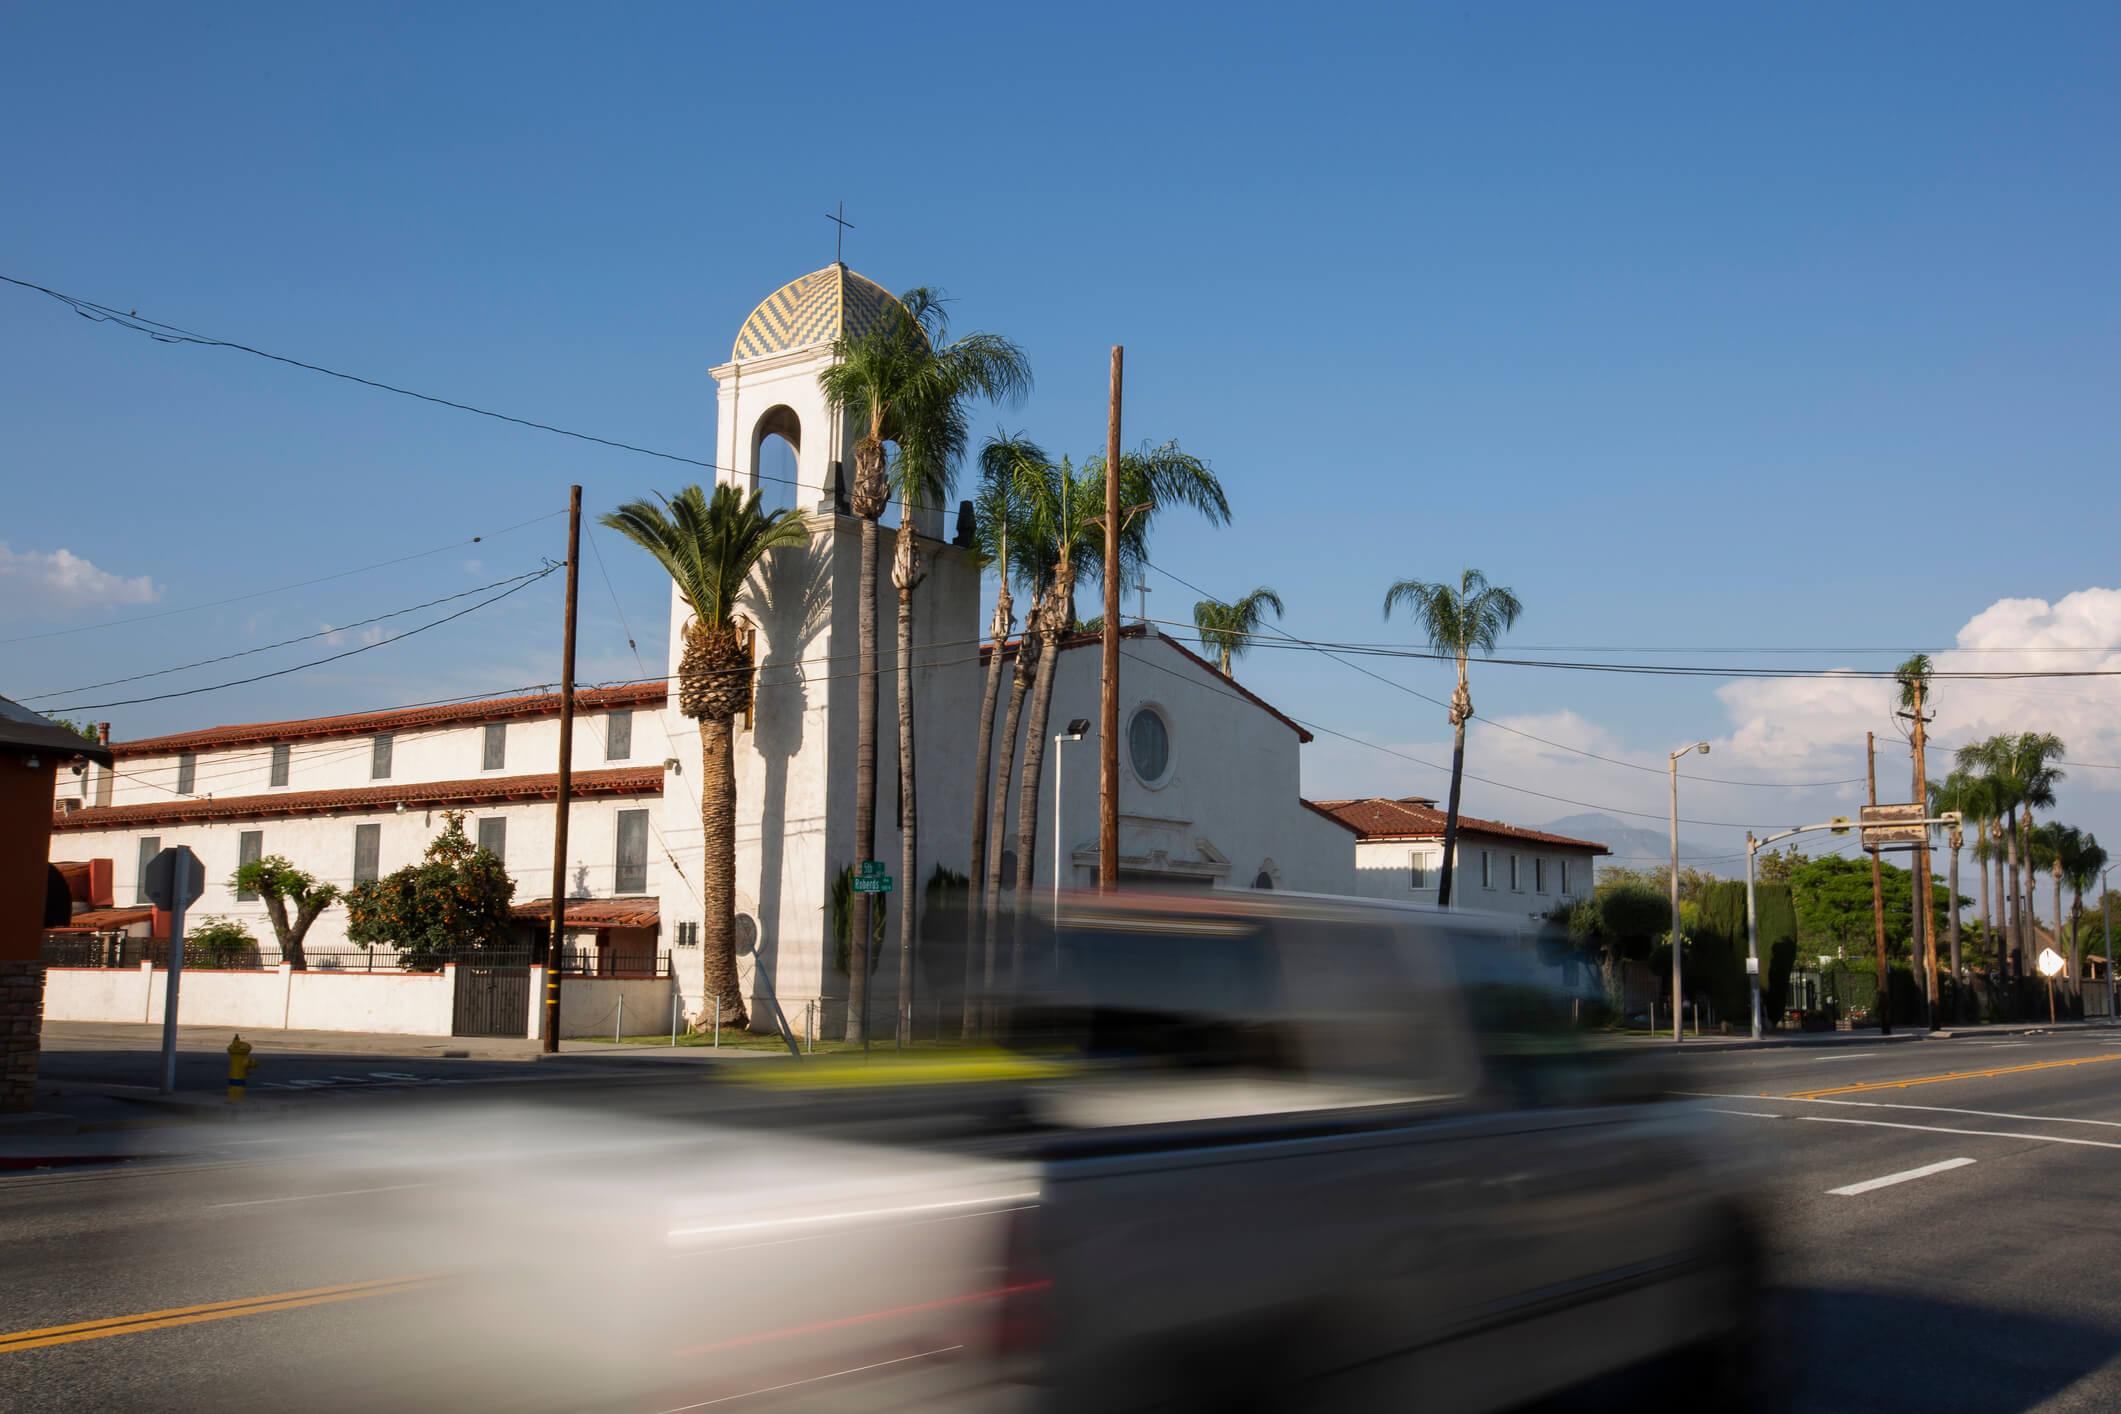 Commercial Security Systems San Bernardino   JMG